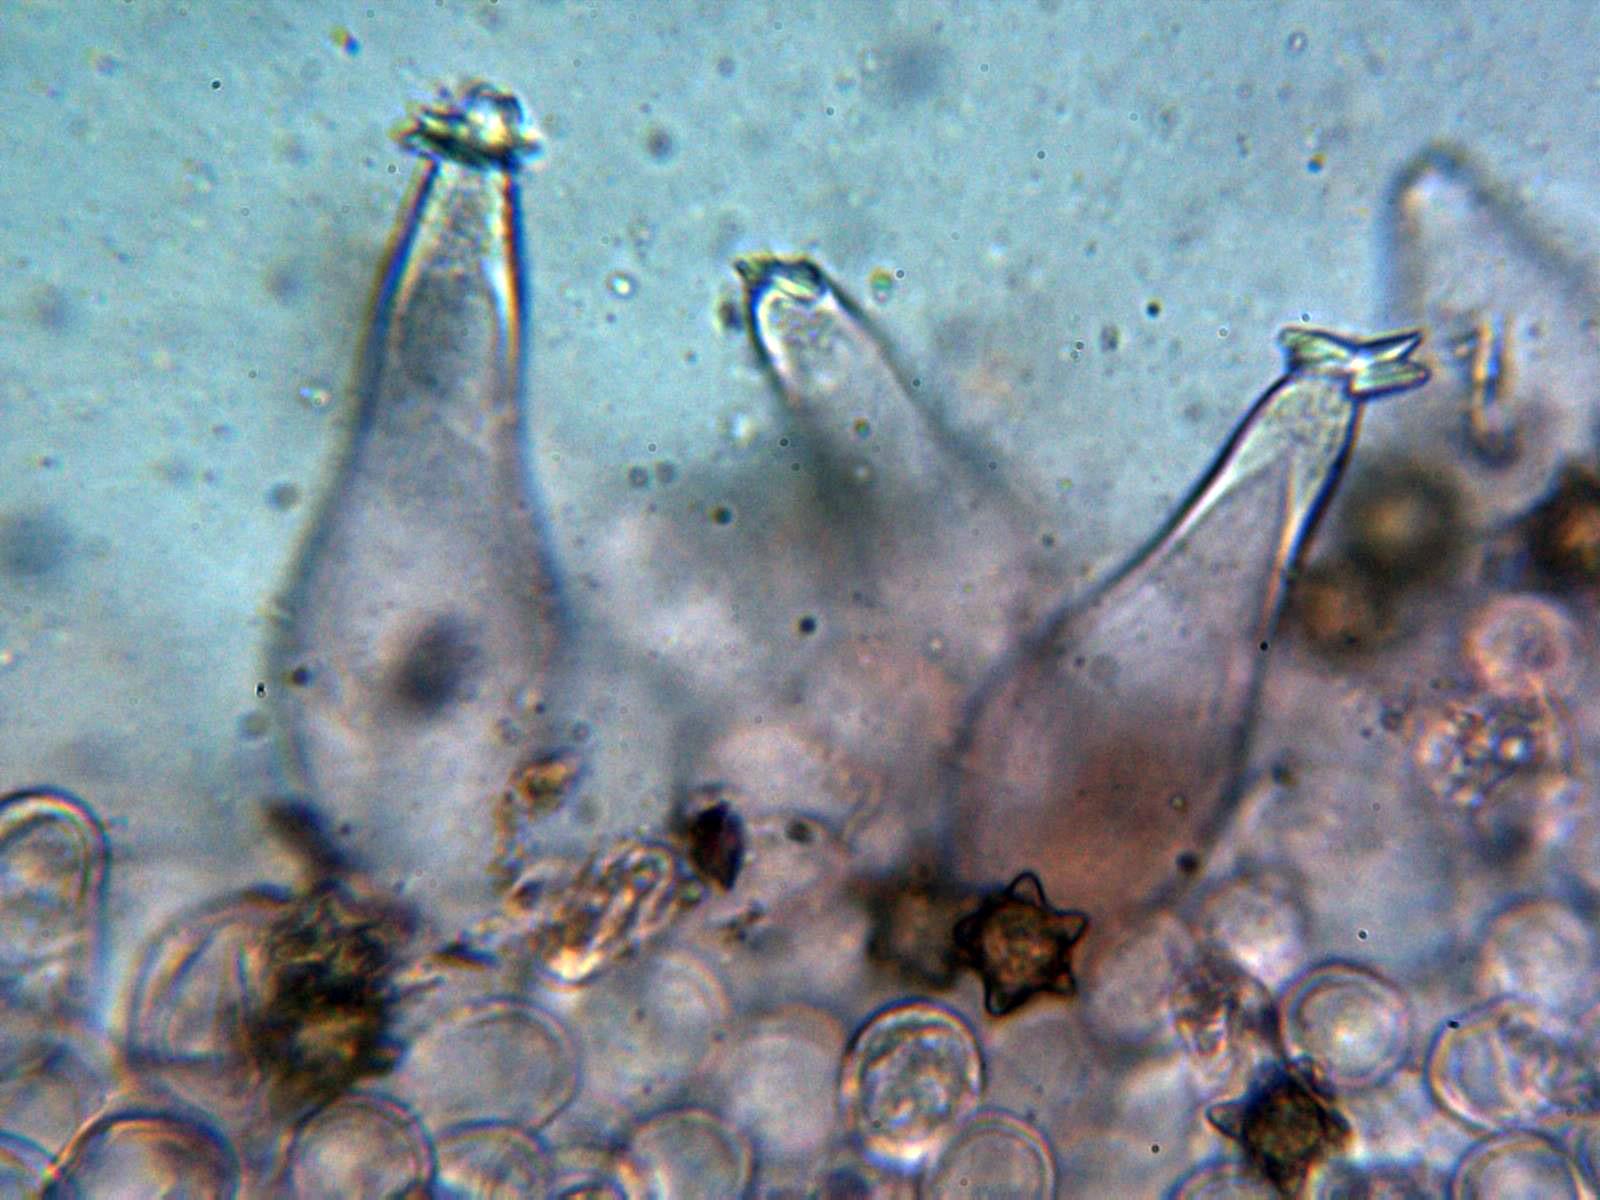 7-Queilocistidios4.jpg